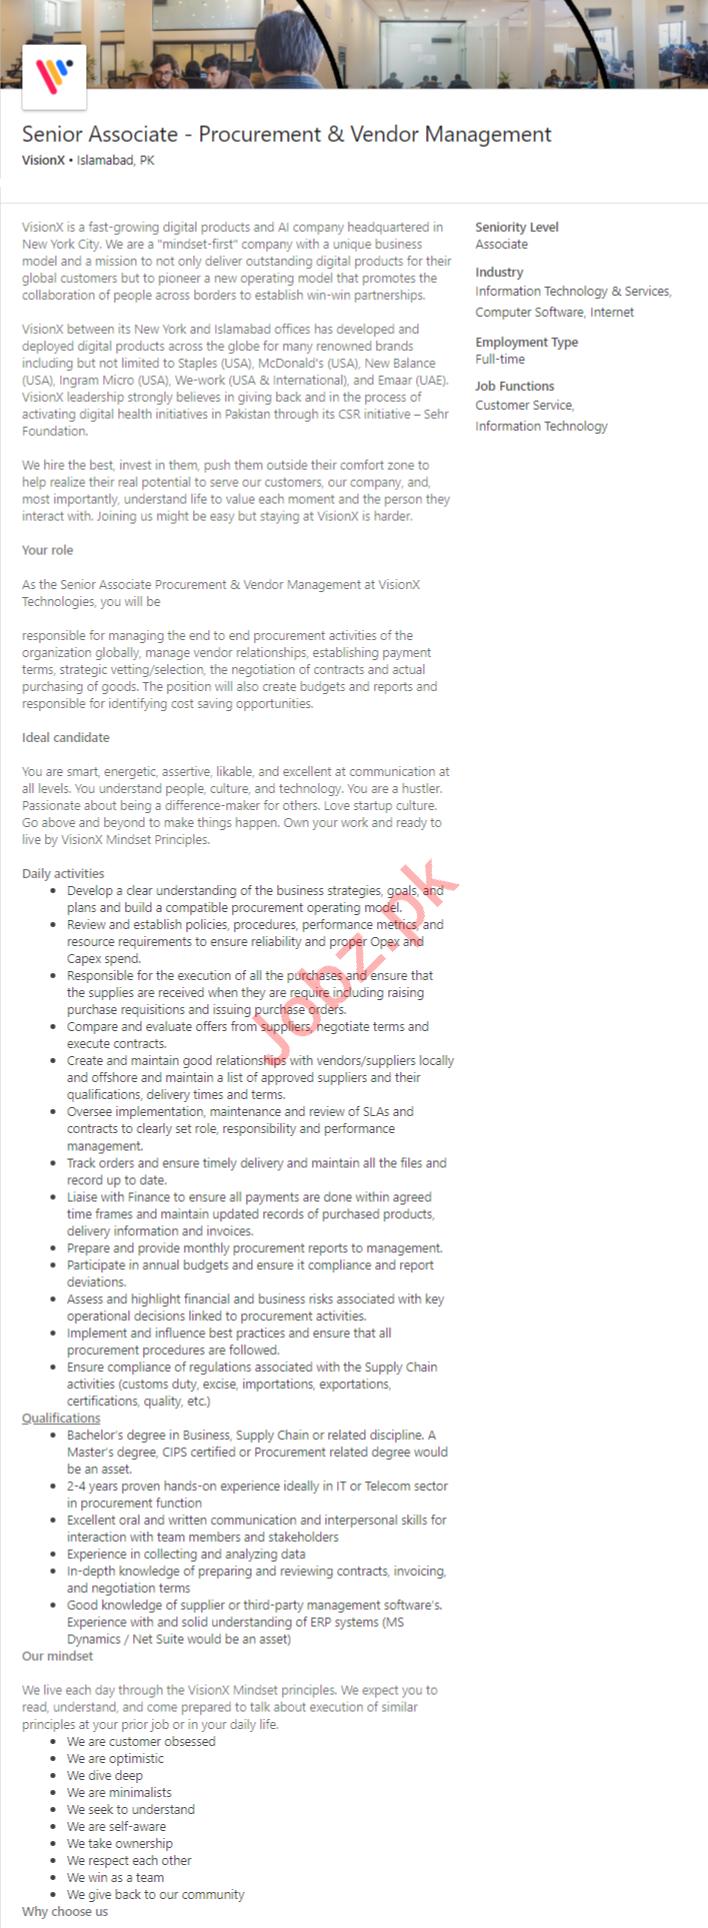 Senior Associate Procurement & Vendor Management Jobs 2020